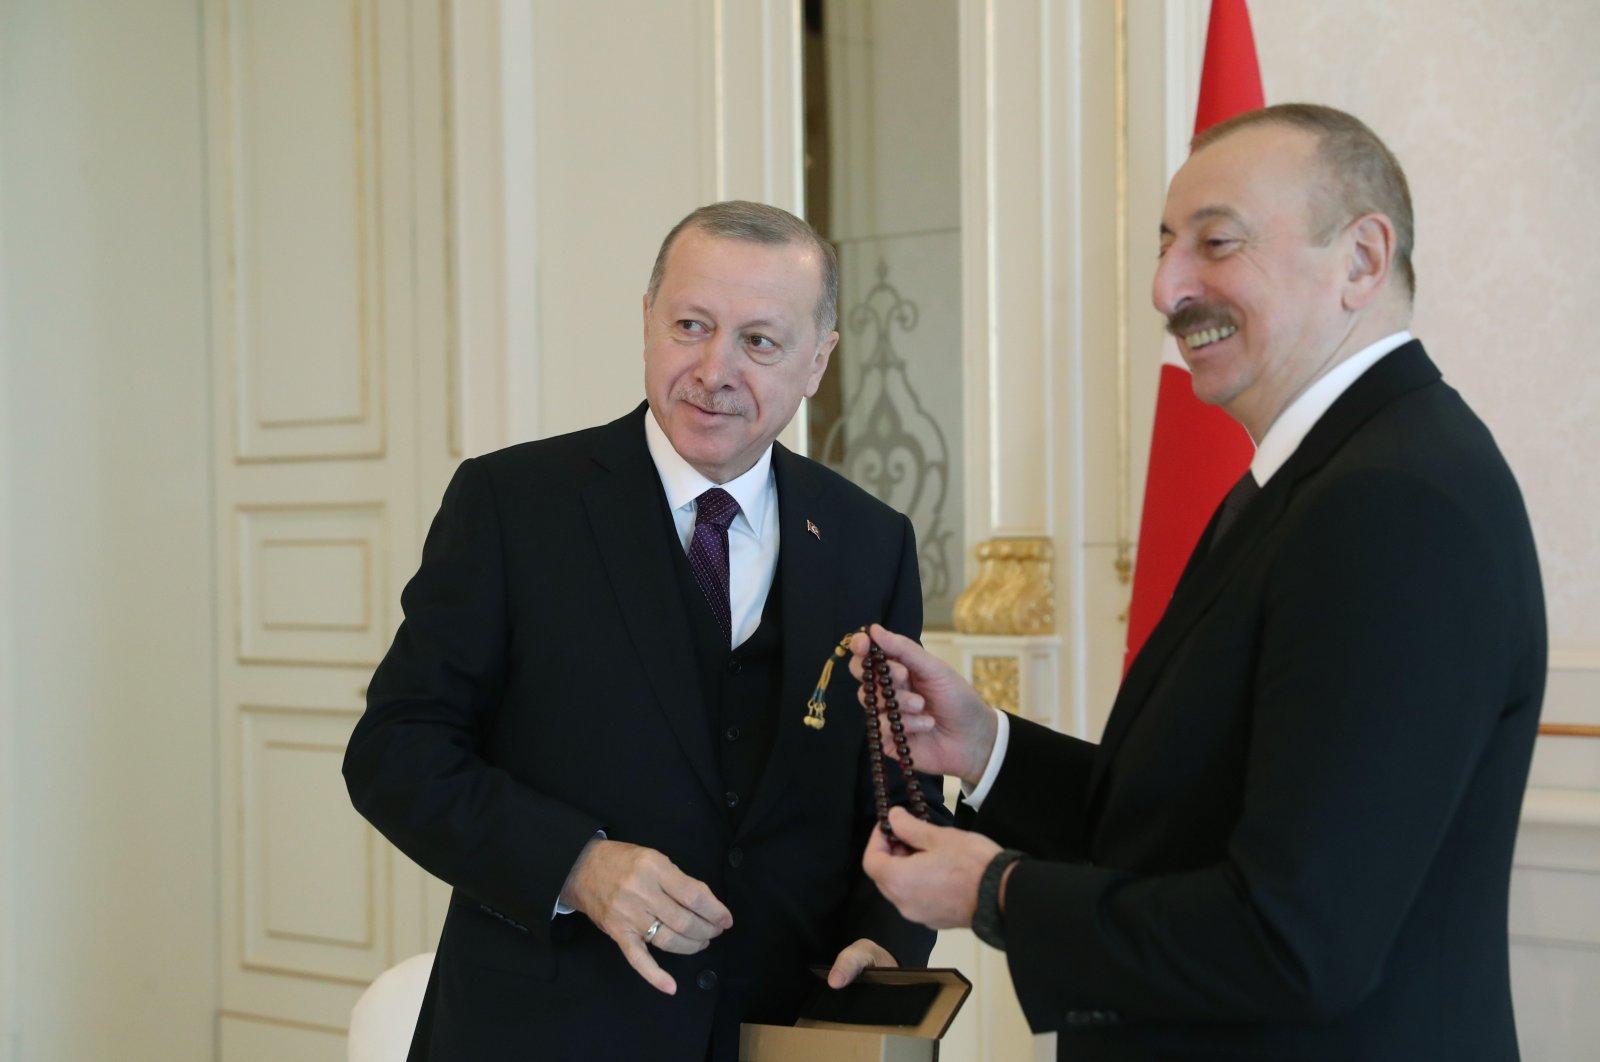 President Recep Tayyip Erdoğan (L) and Azerbaijani President Ilham Aliyev during a meeting in Baku, Feb. 26, 2020. (AA Photo)